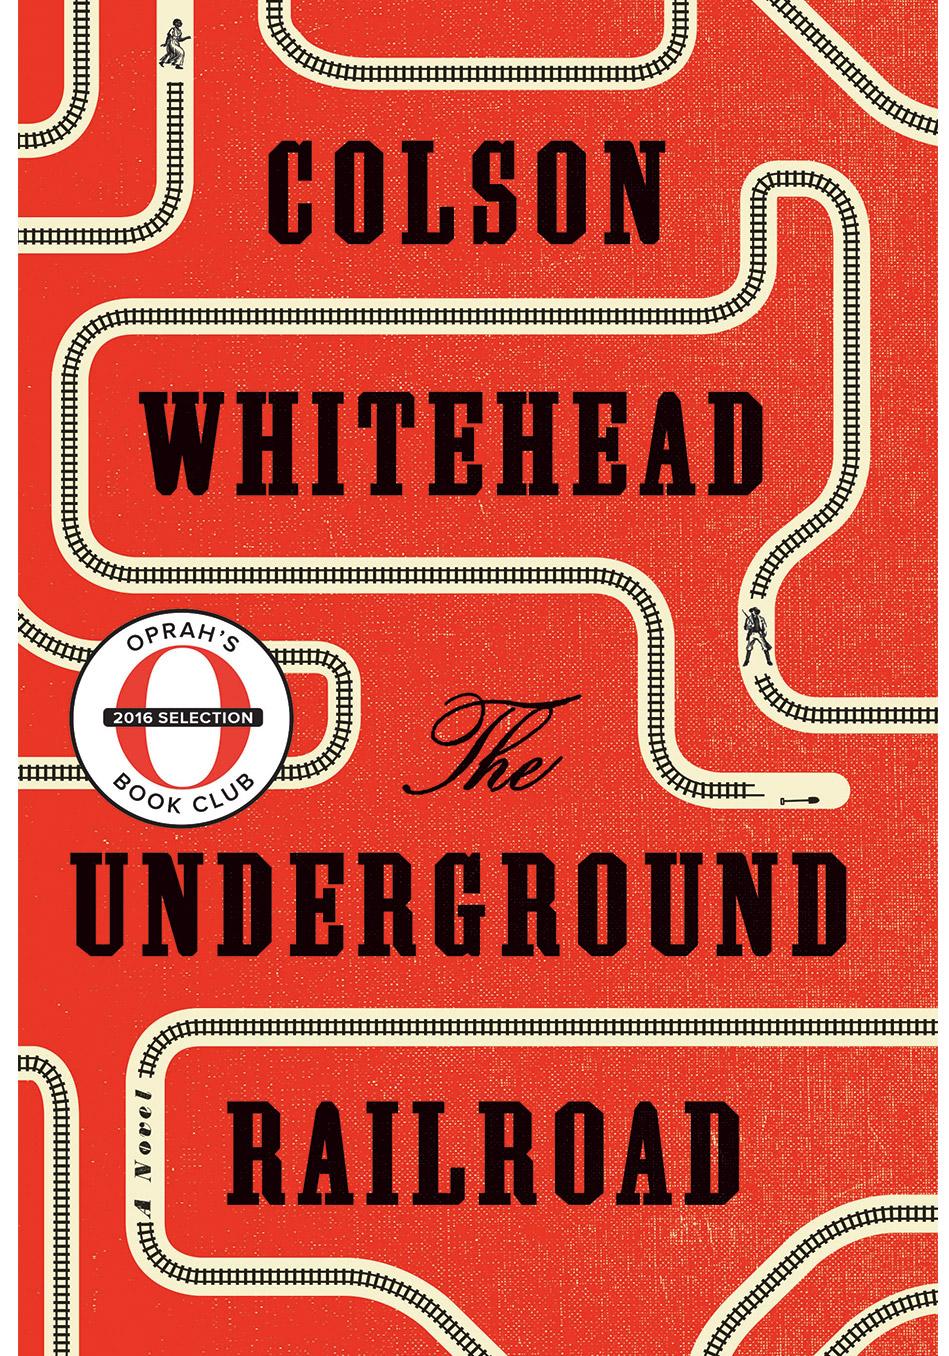 201607-orig-underground-railroad-cover-949x1356.jpg